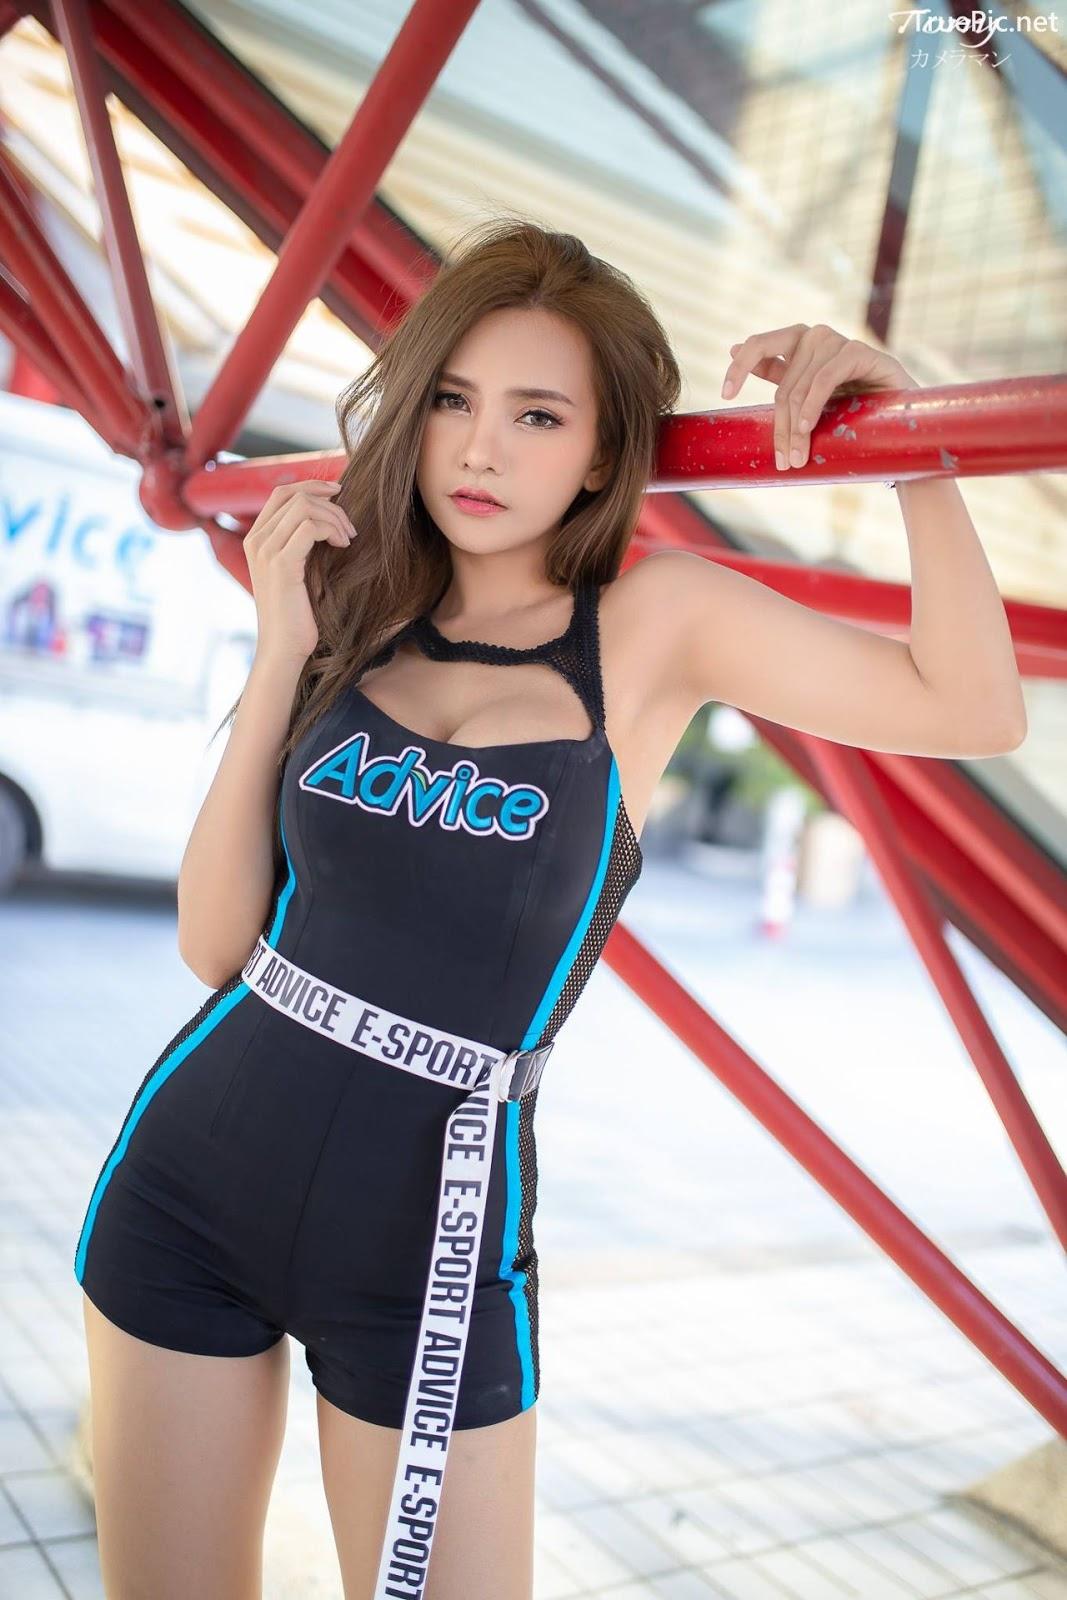 Image-Thailand-Hot-Model-Thai-PG-At-Commart-2018-TruePic.net- Picture-46